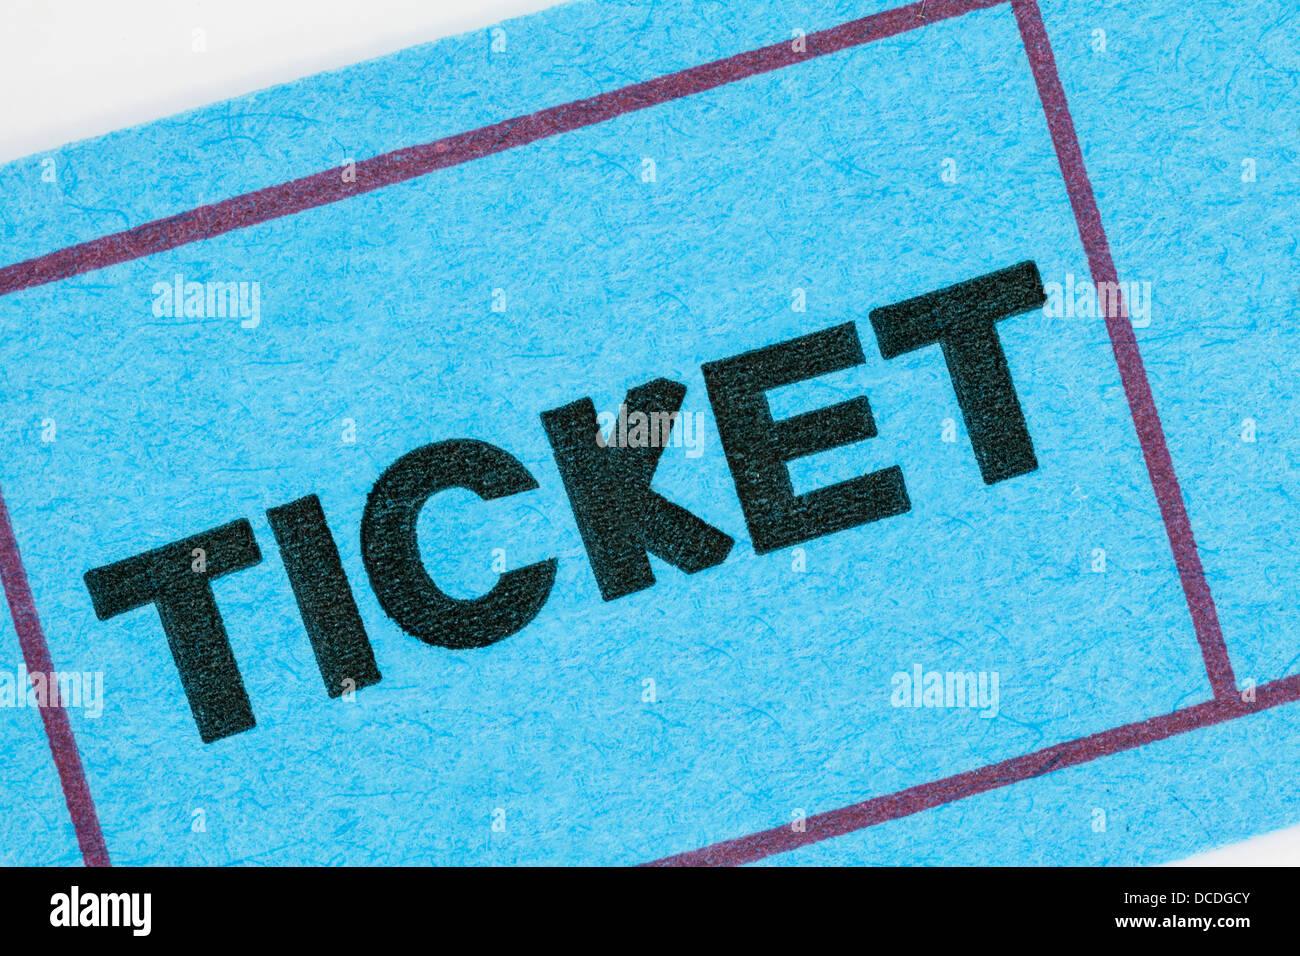 Blue ticket stub macro detail. - Stock Image